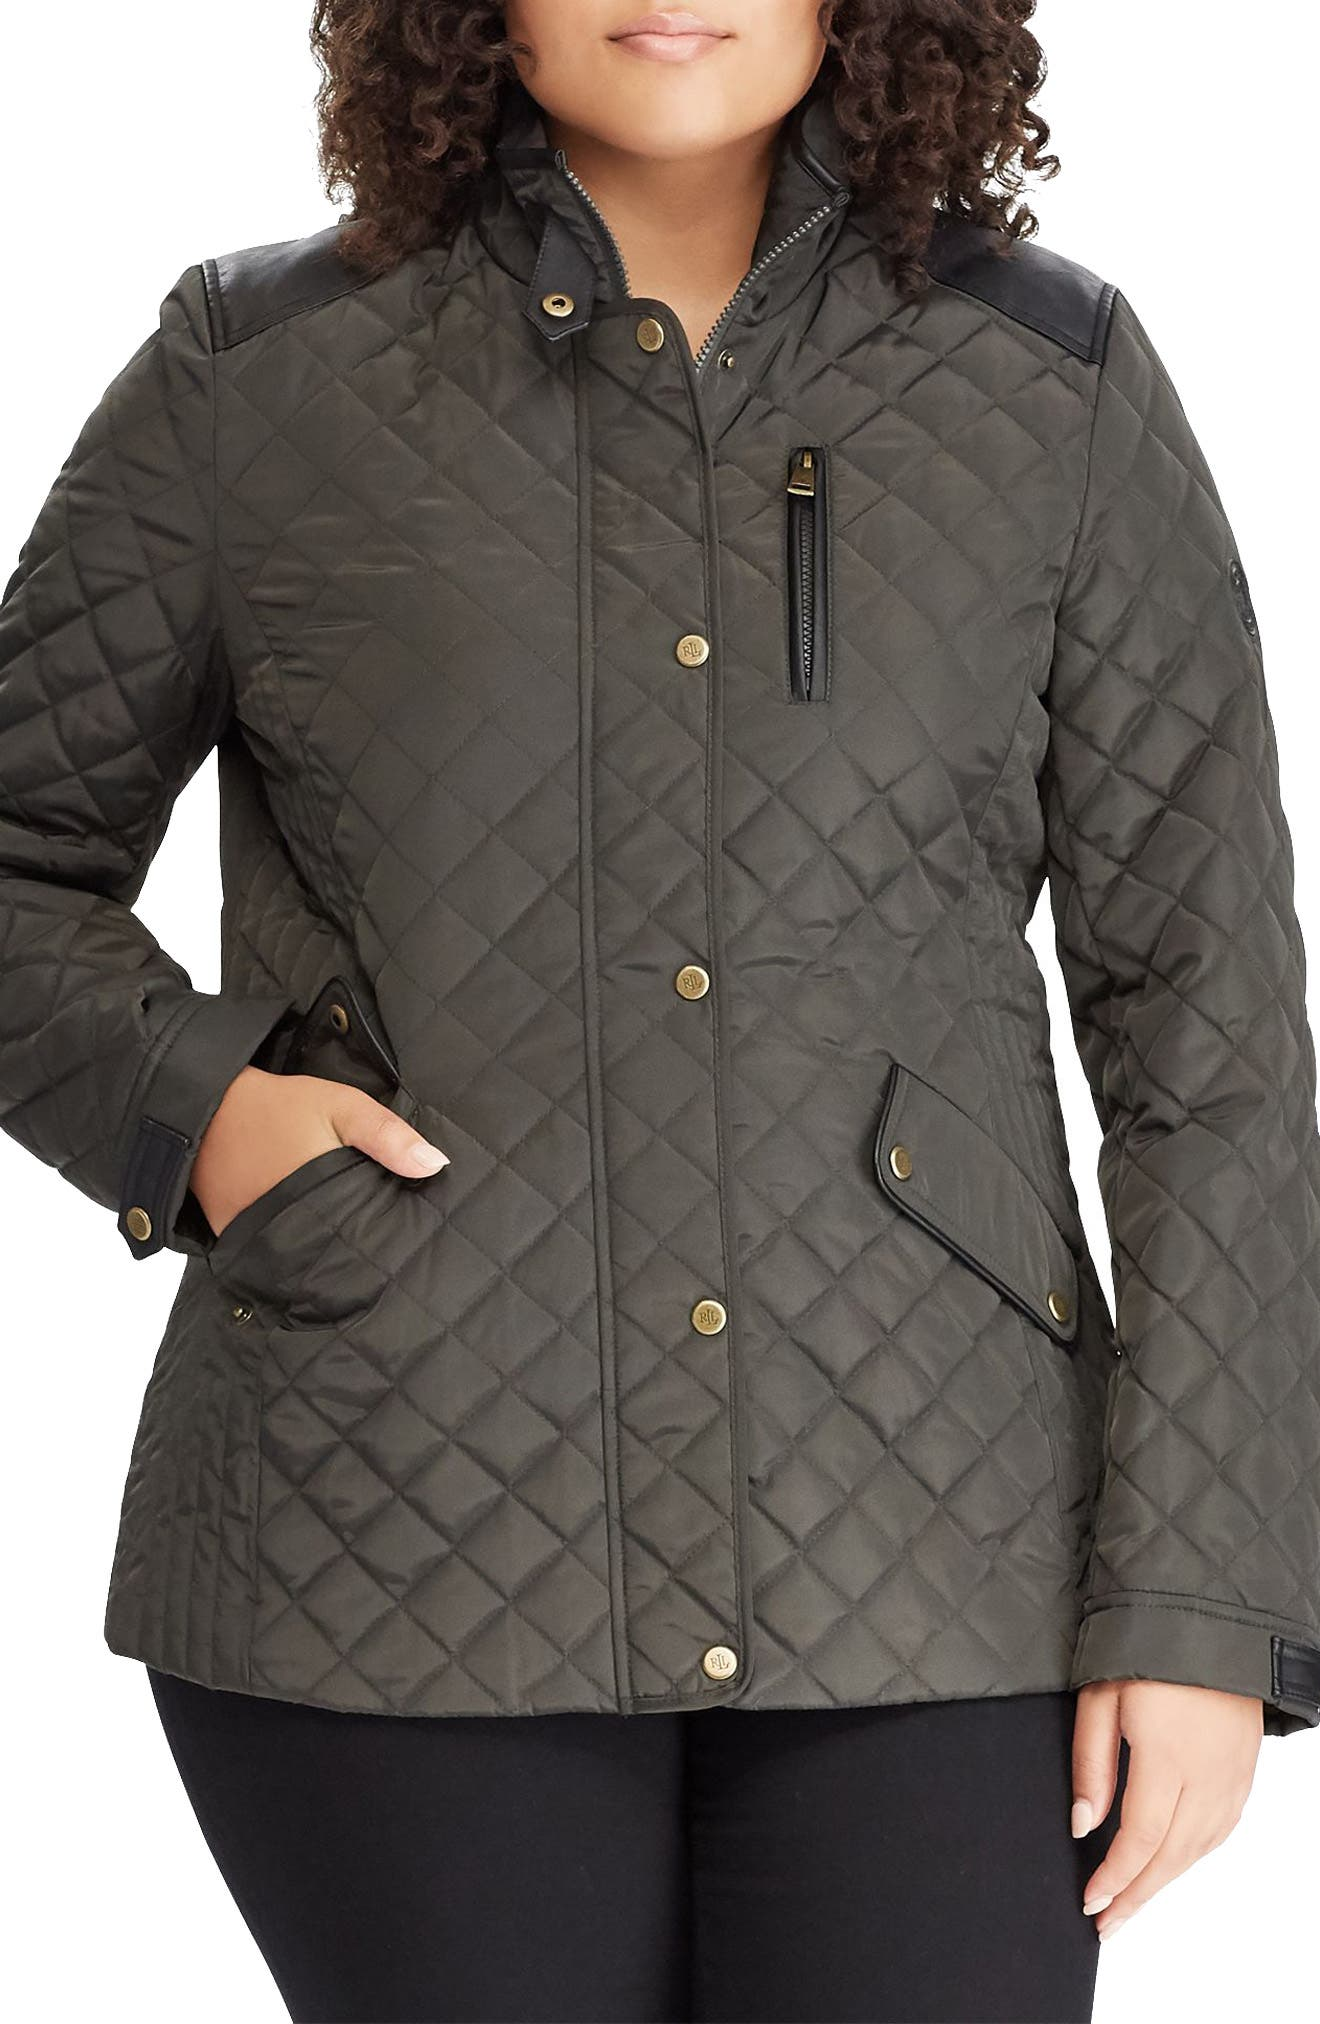 LAUREN RALPH LAUREN Quilted Jacket with Faux Leather Trim, Main, color, 300